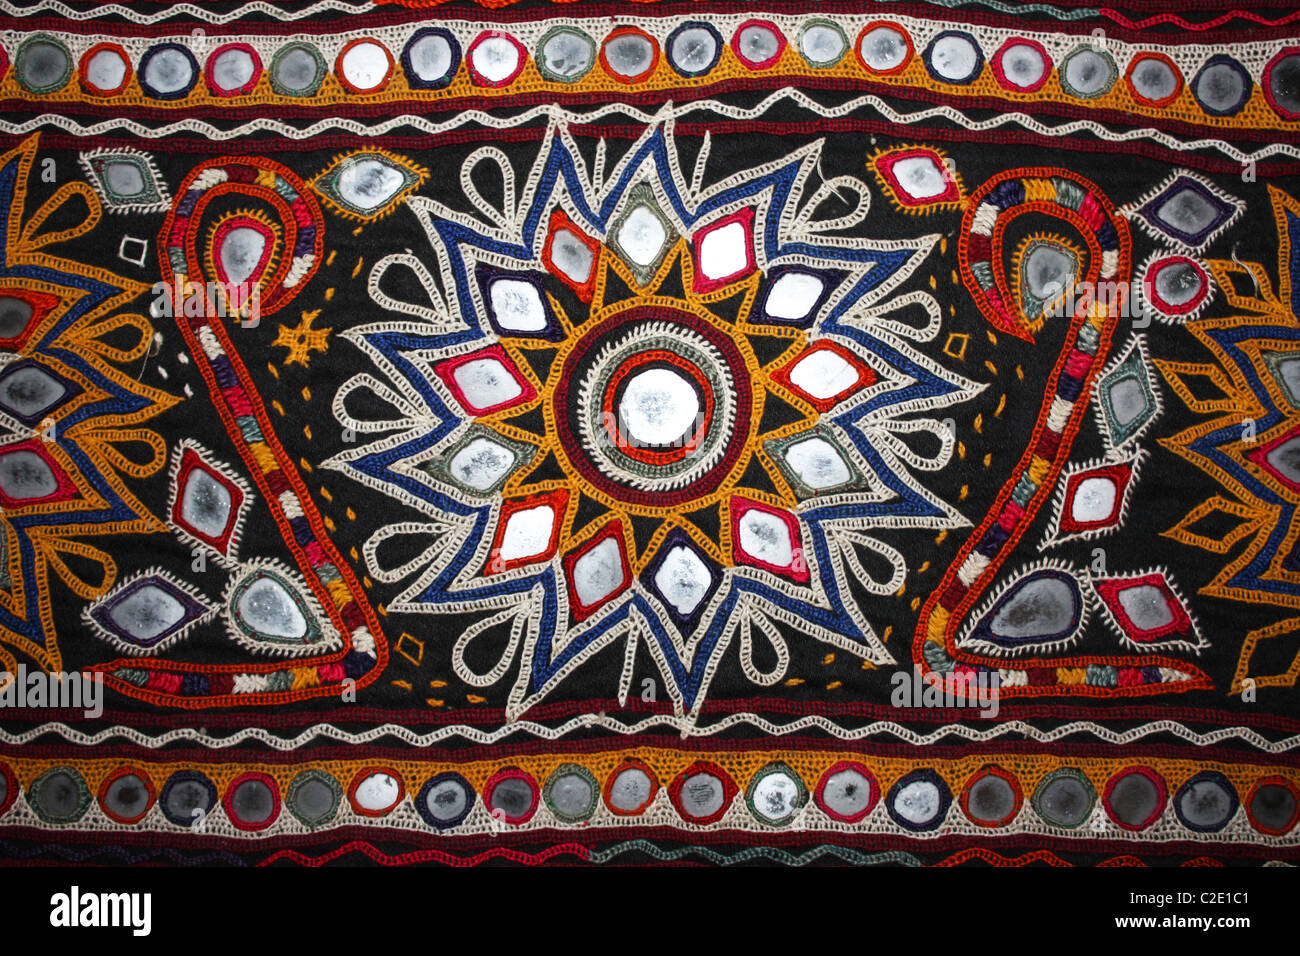 Gujarati Embroidery Toran Western India Stock Photo Royalty Free Image 35958497 - Alamy